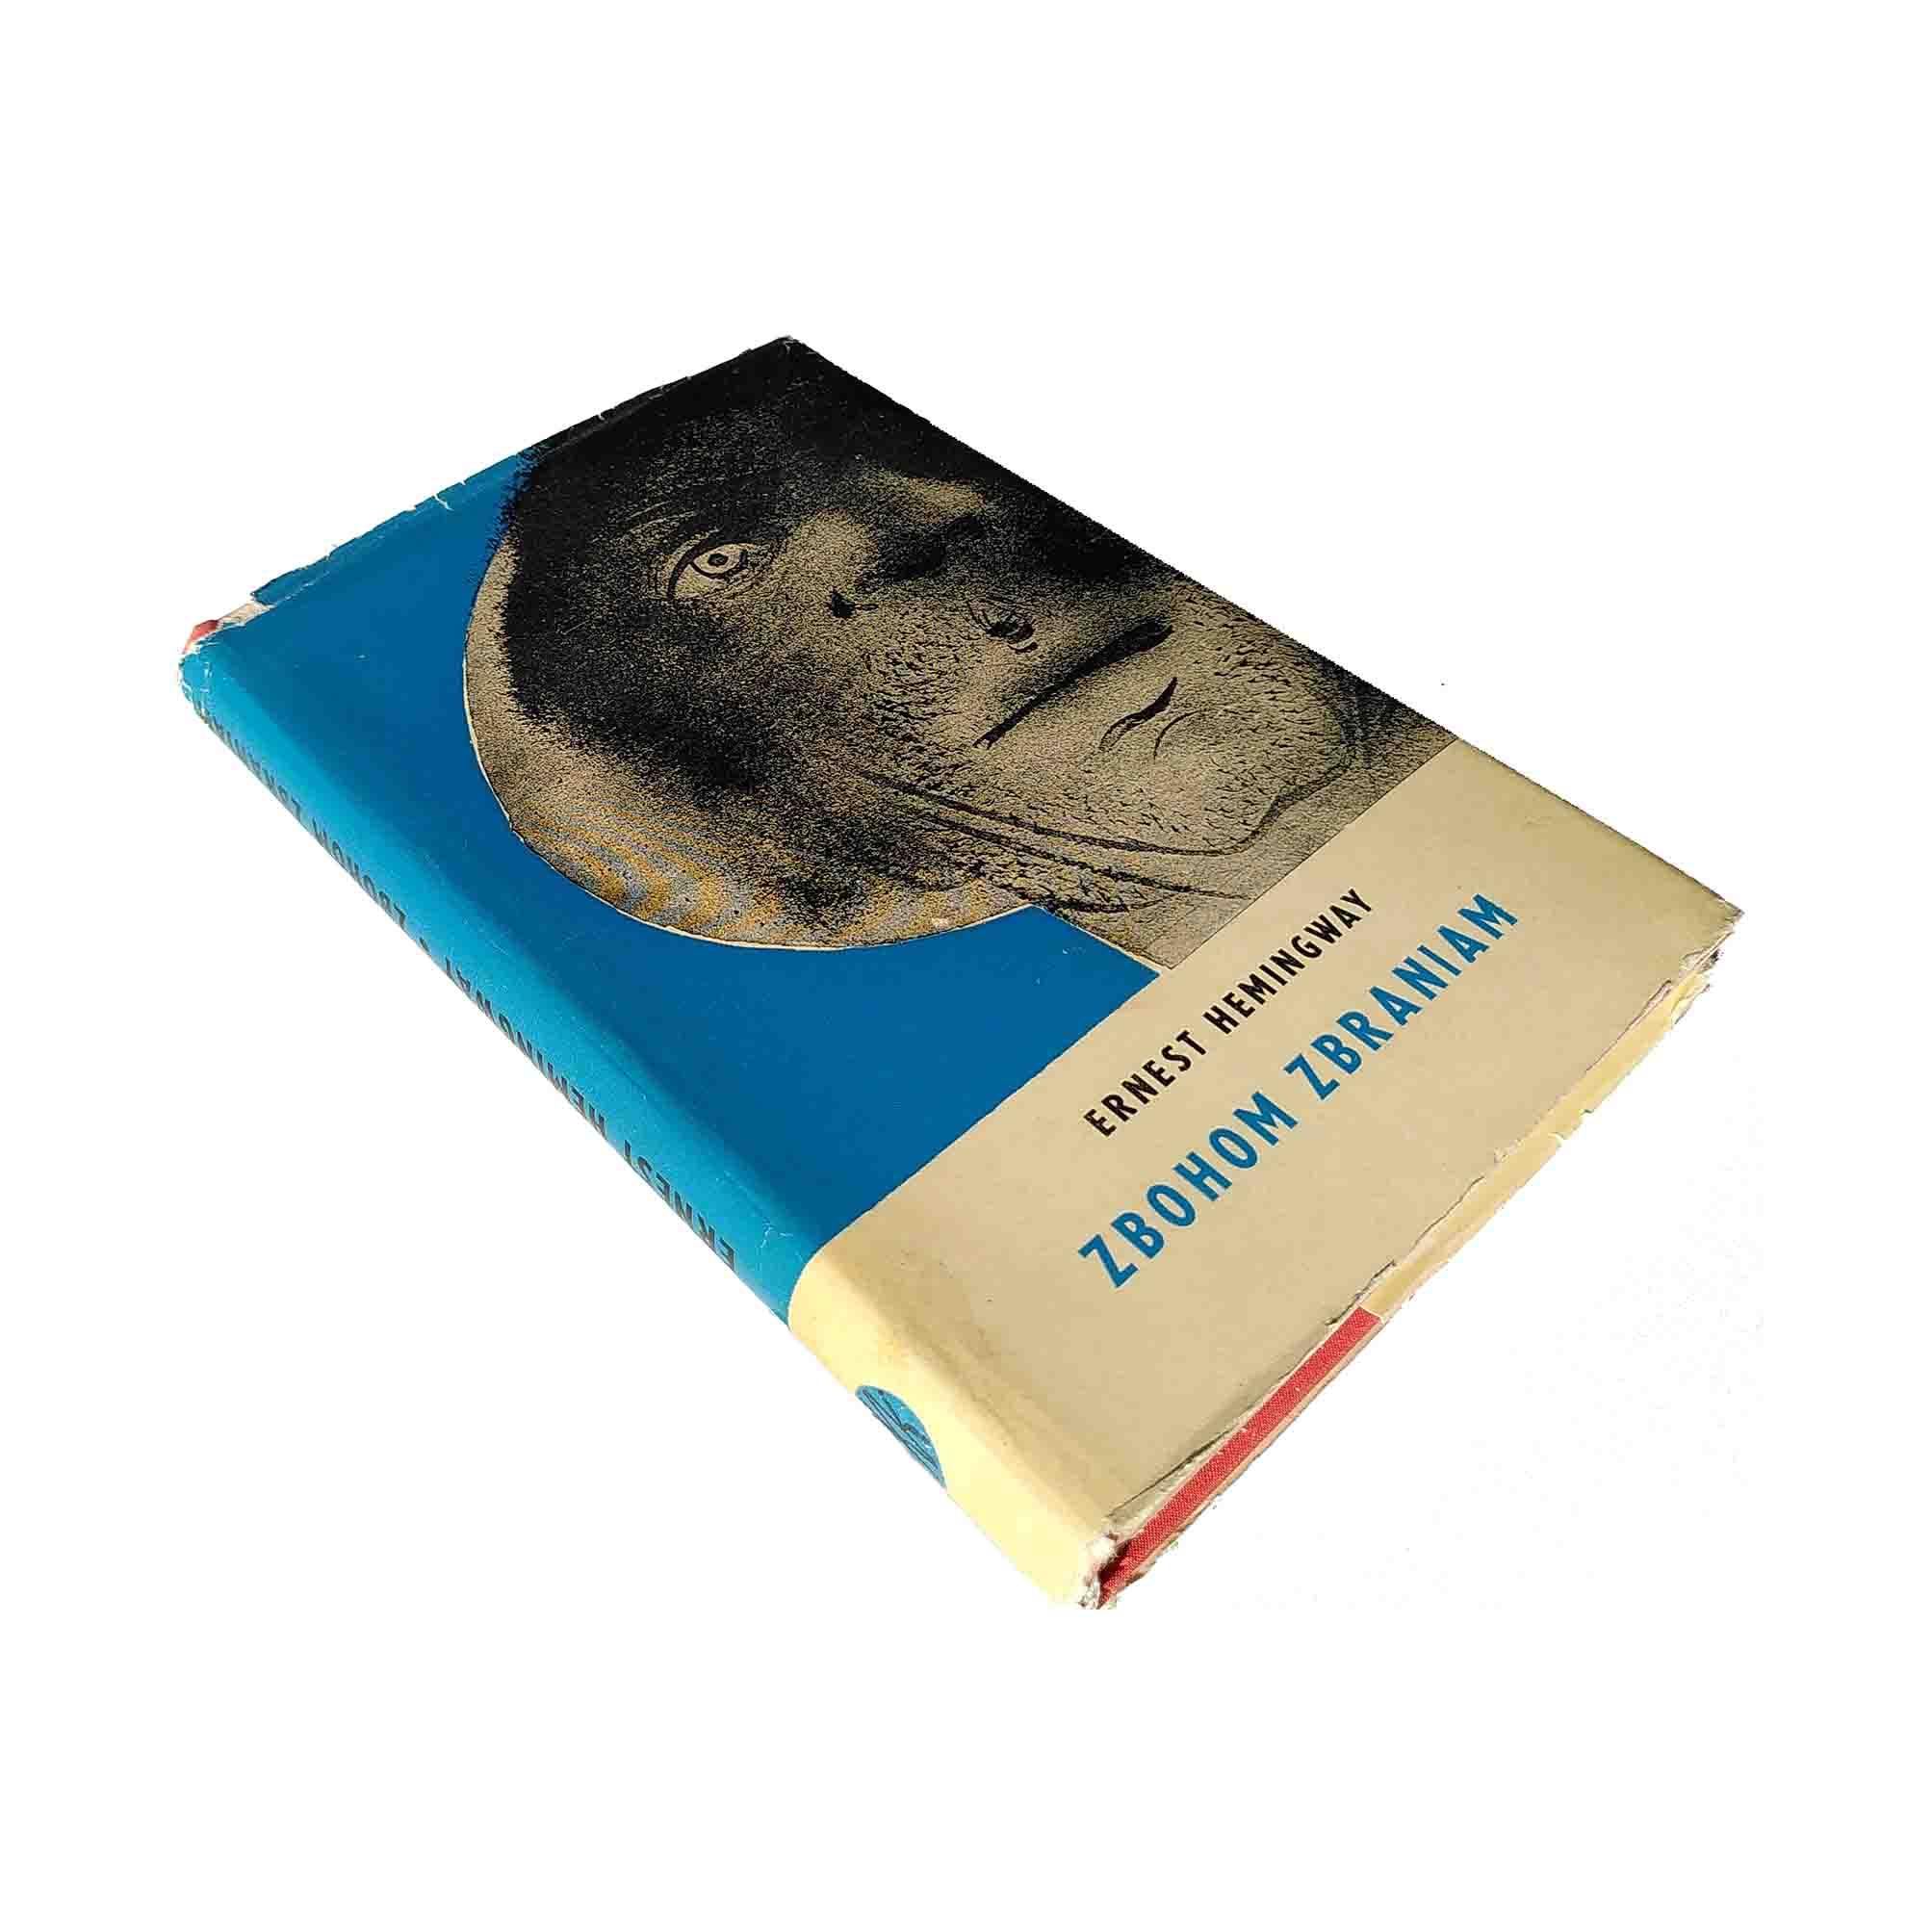 5914-Hemingway-Farwell-Slovak-First-Edition-1964-Dust-Jacket-free-N.jpg